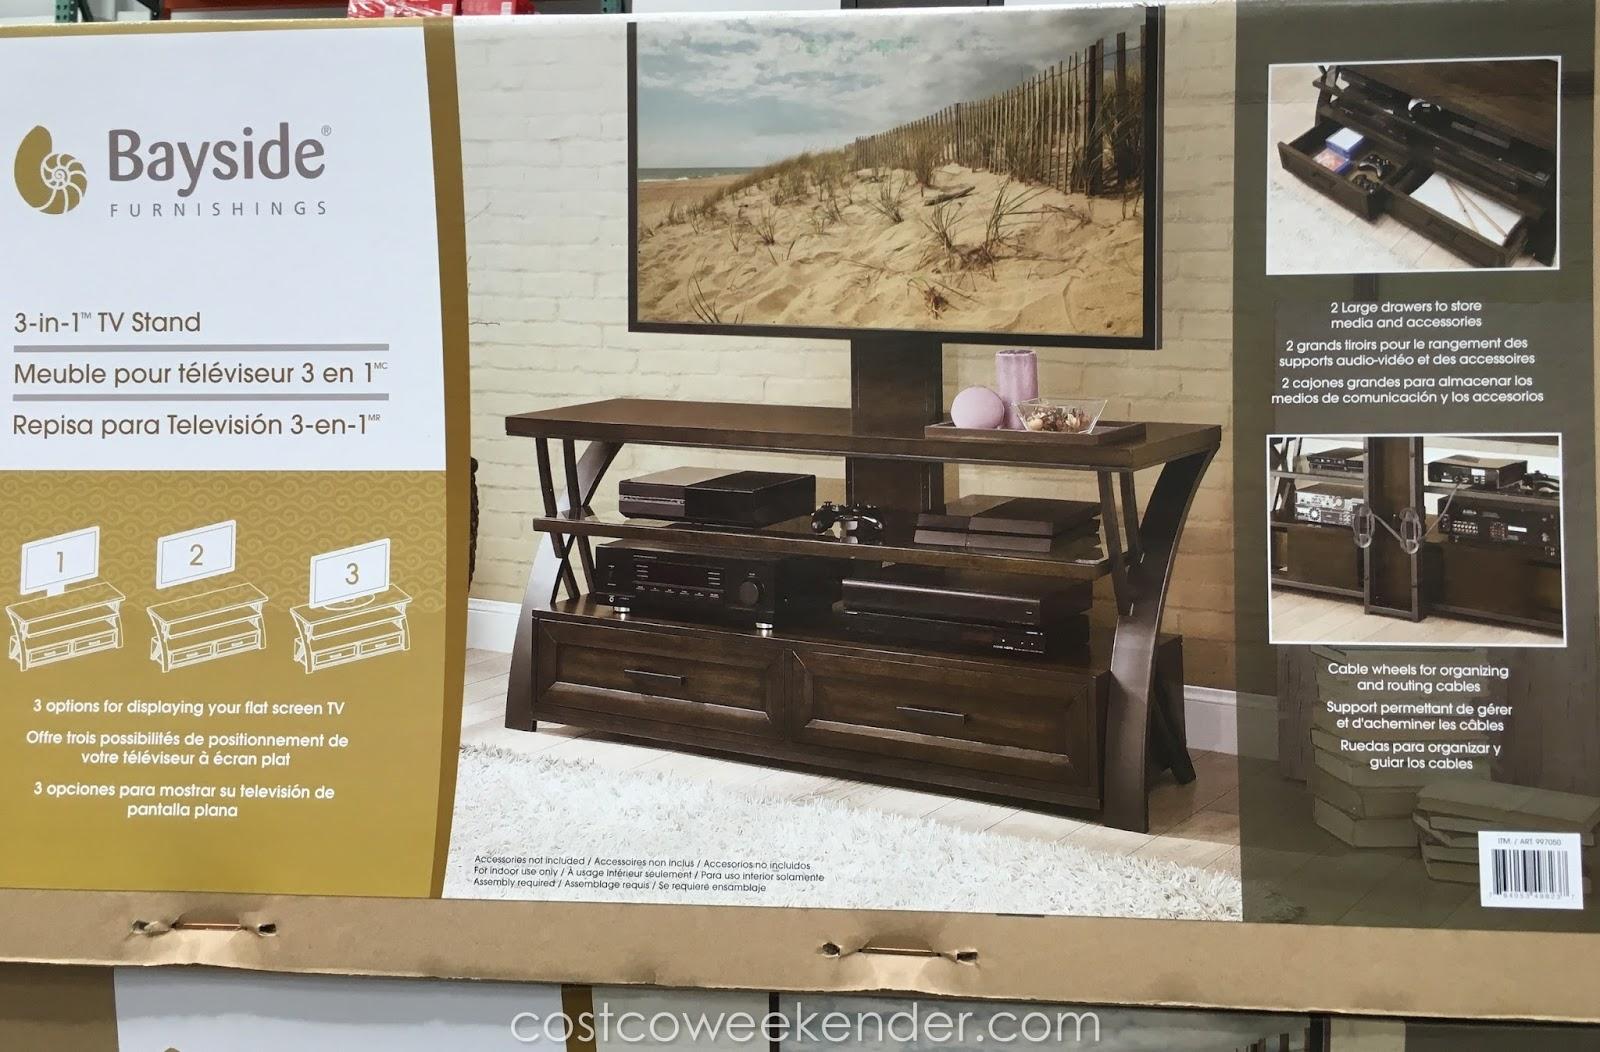 Bayside Furnishings 3 In 1 Tv Stand Costco Weekender